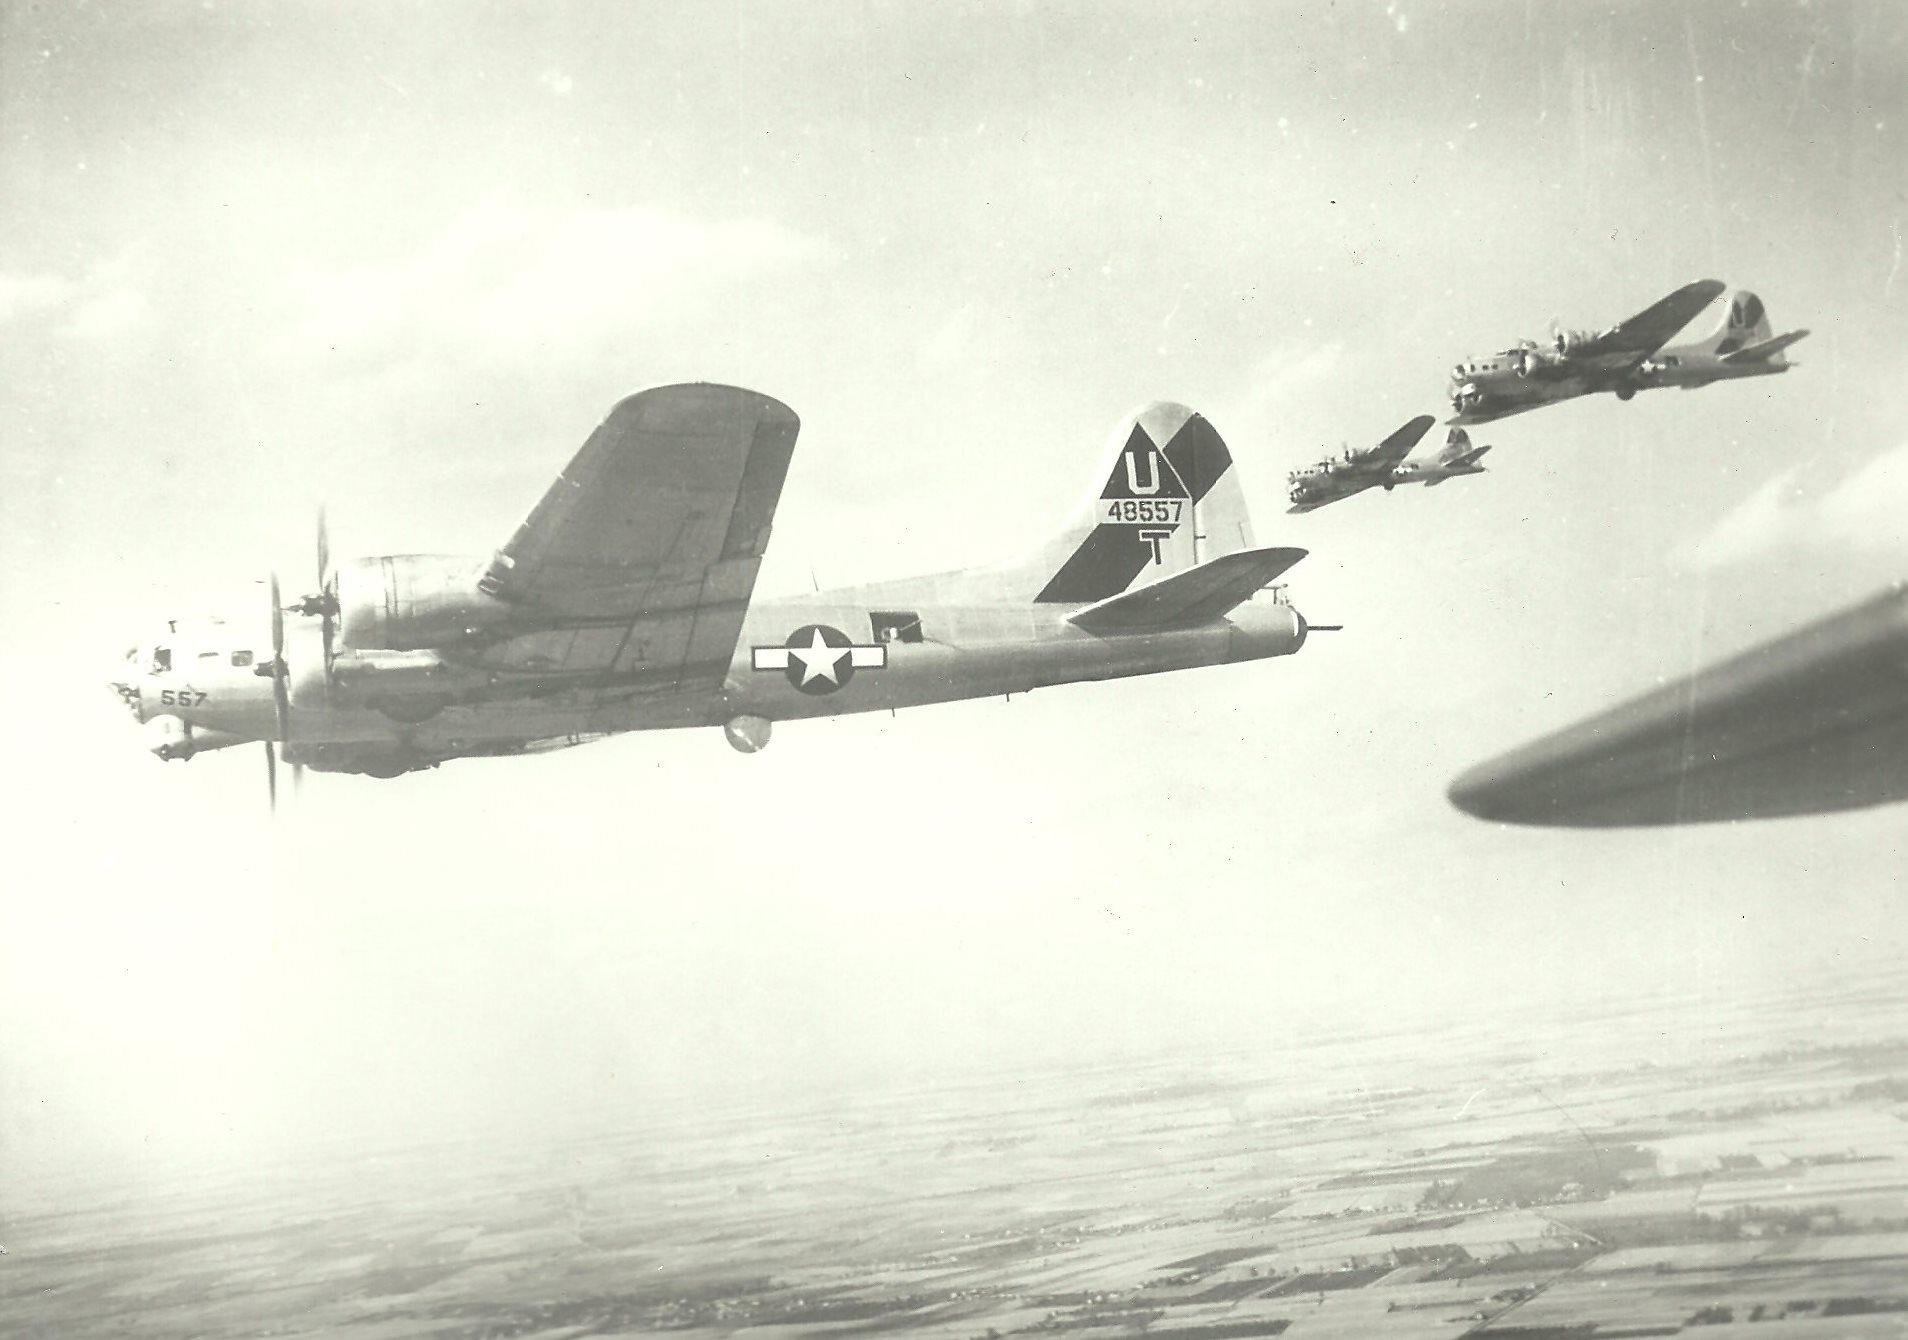 B-17 #44-8557